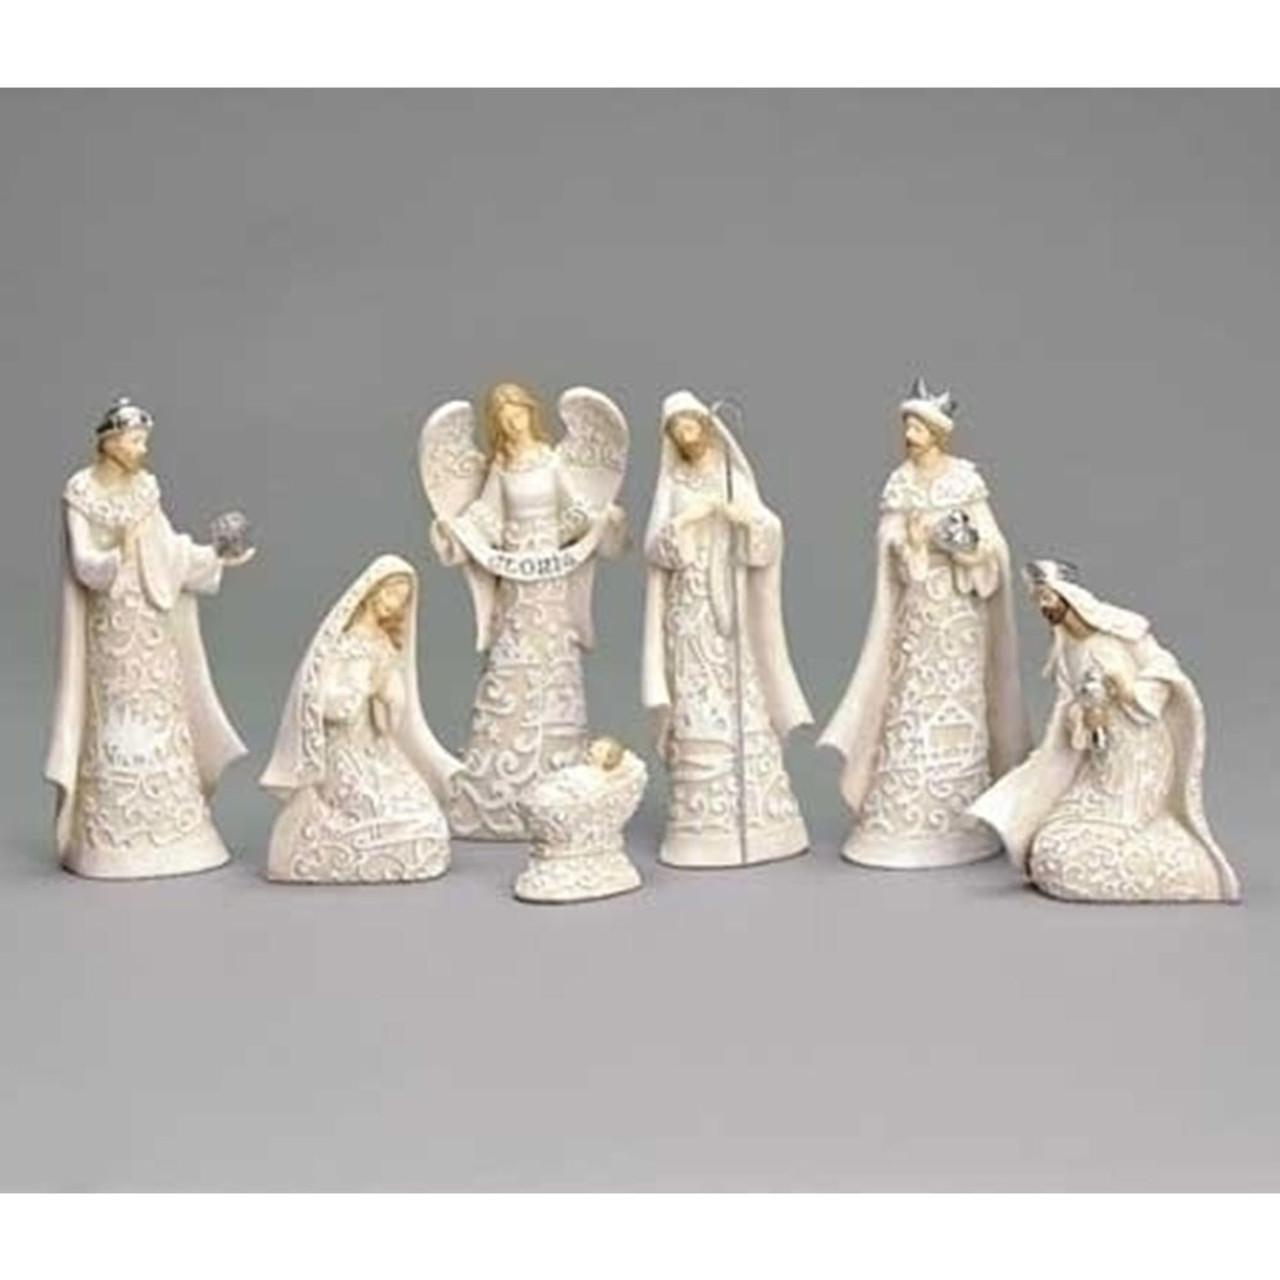 "7-Piece Nativity Set - 7.5""H"